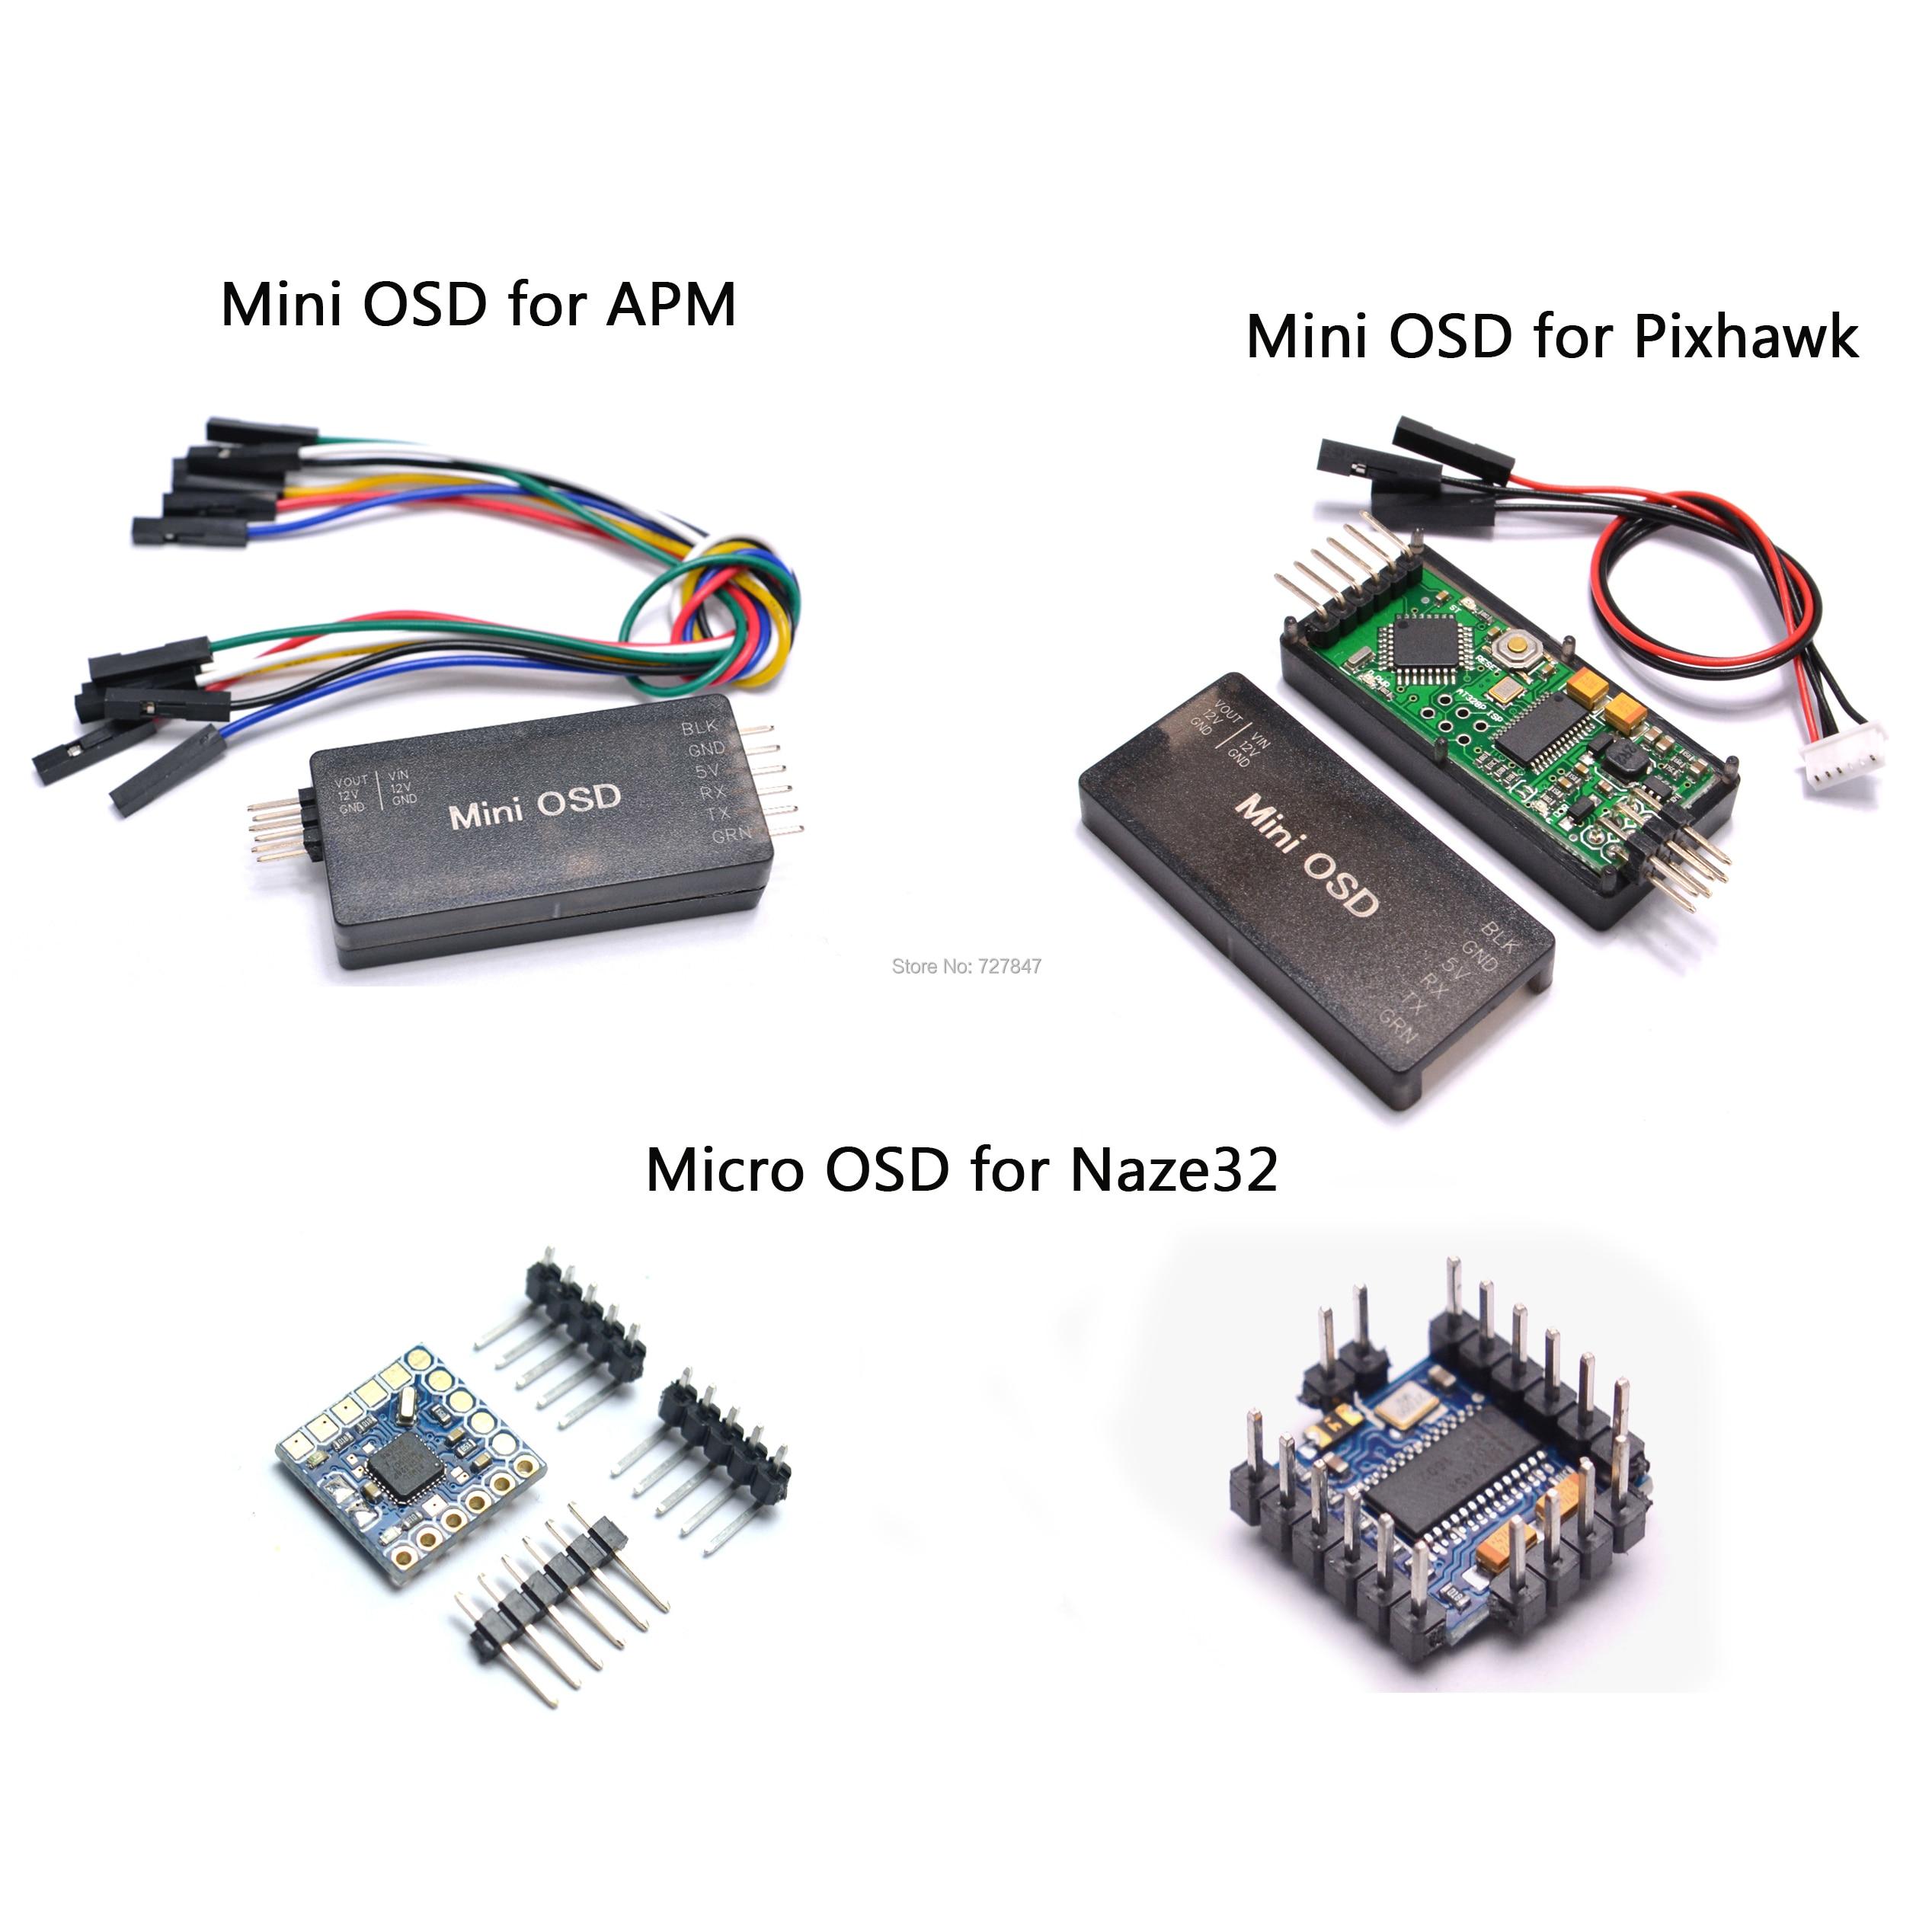 MICRO MINIMOSD Minim OSD Mini OSD For Quadcopter Multicopter APM / PIXHAWK / NAZE32 Flight Control(China)